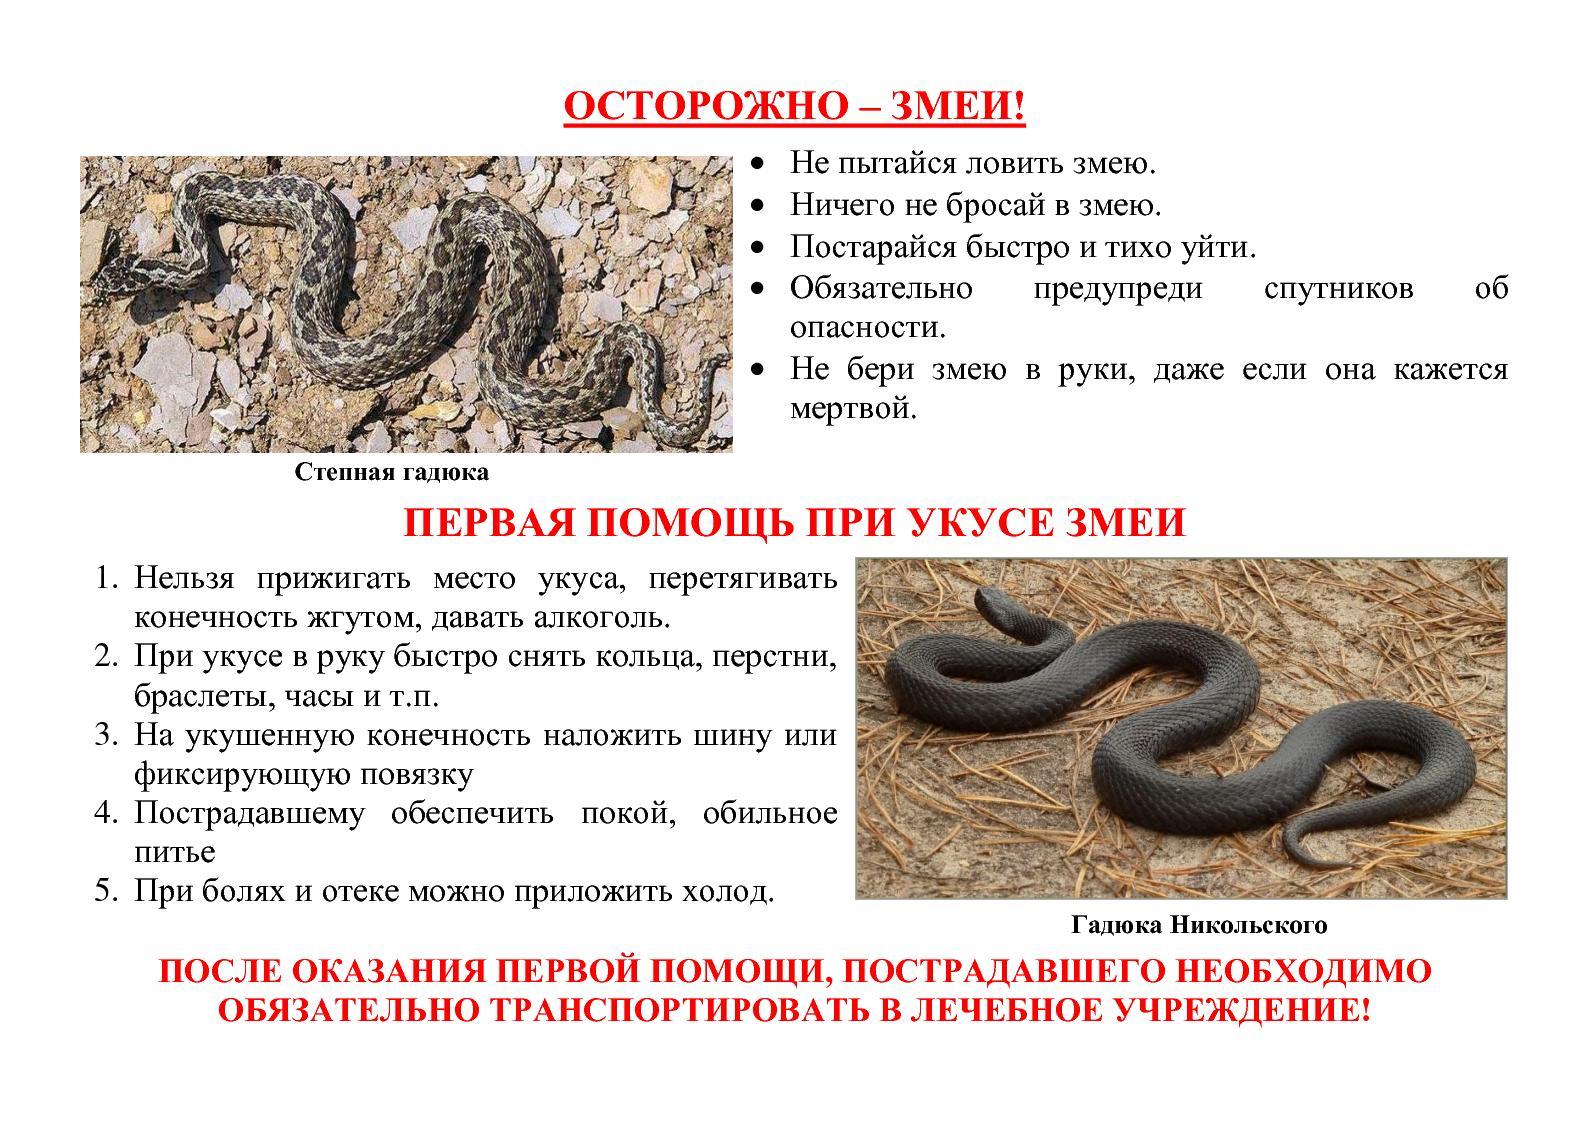 http://pozhva.permarea.ru/upload/versions/11639/11138/zmei.jpg